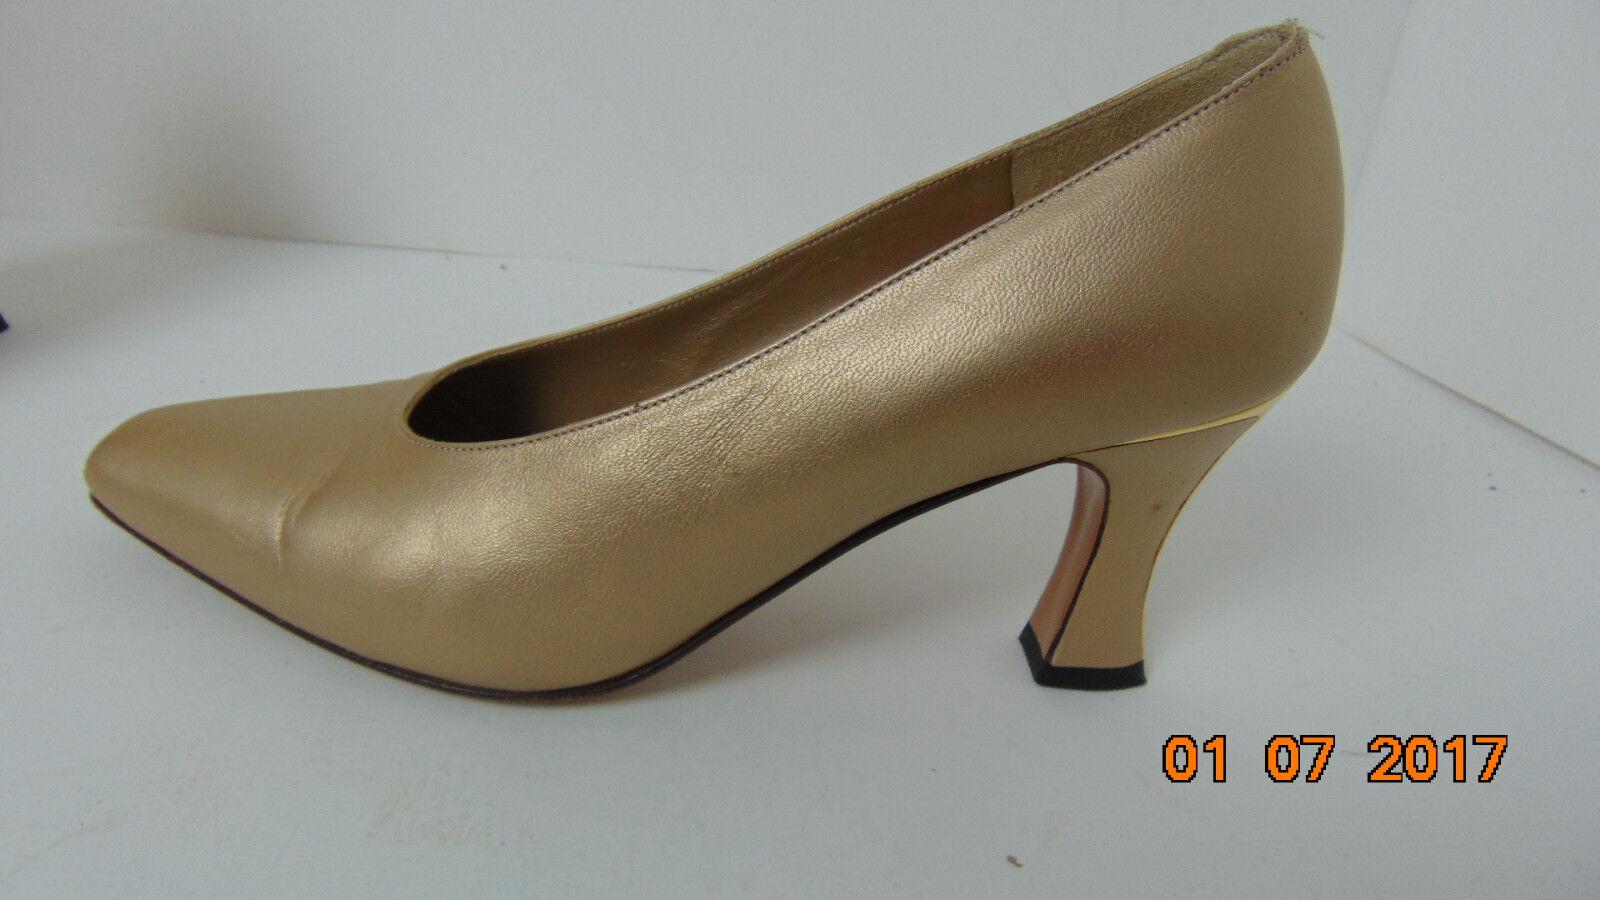 St. John Wheat Beige Métallique CUIR Escarpins T 6.5 B chaussures MADE IN ITALY